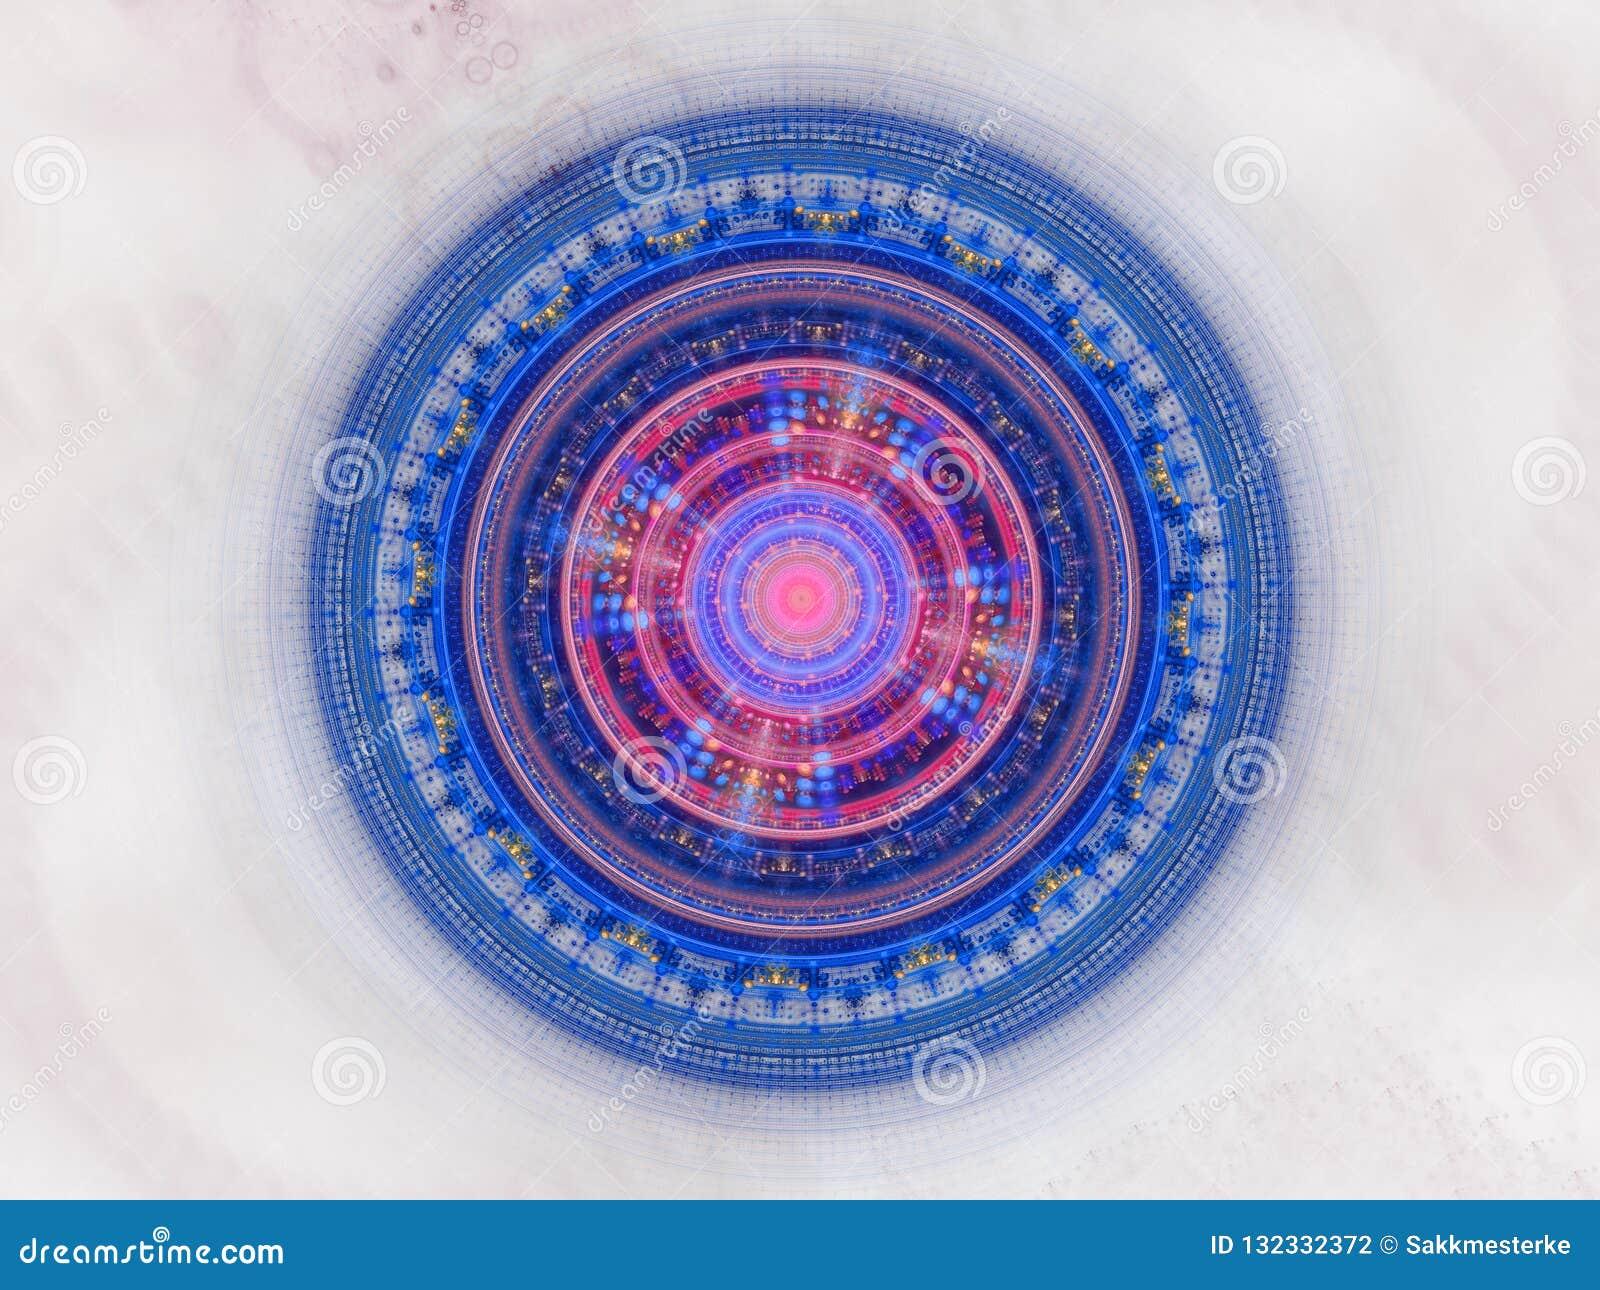 Joint galactique futuriste bleu